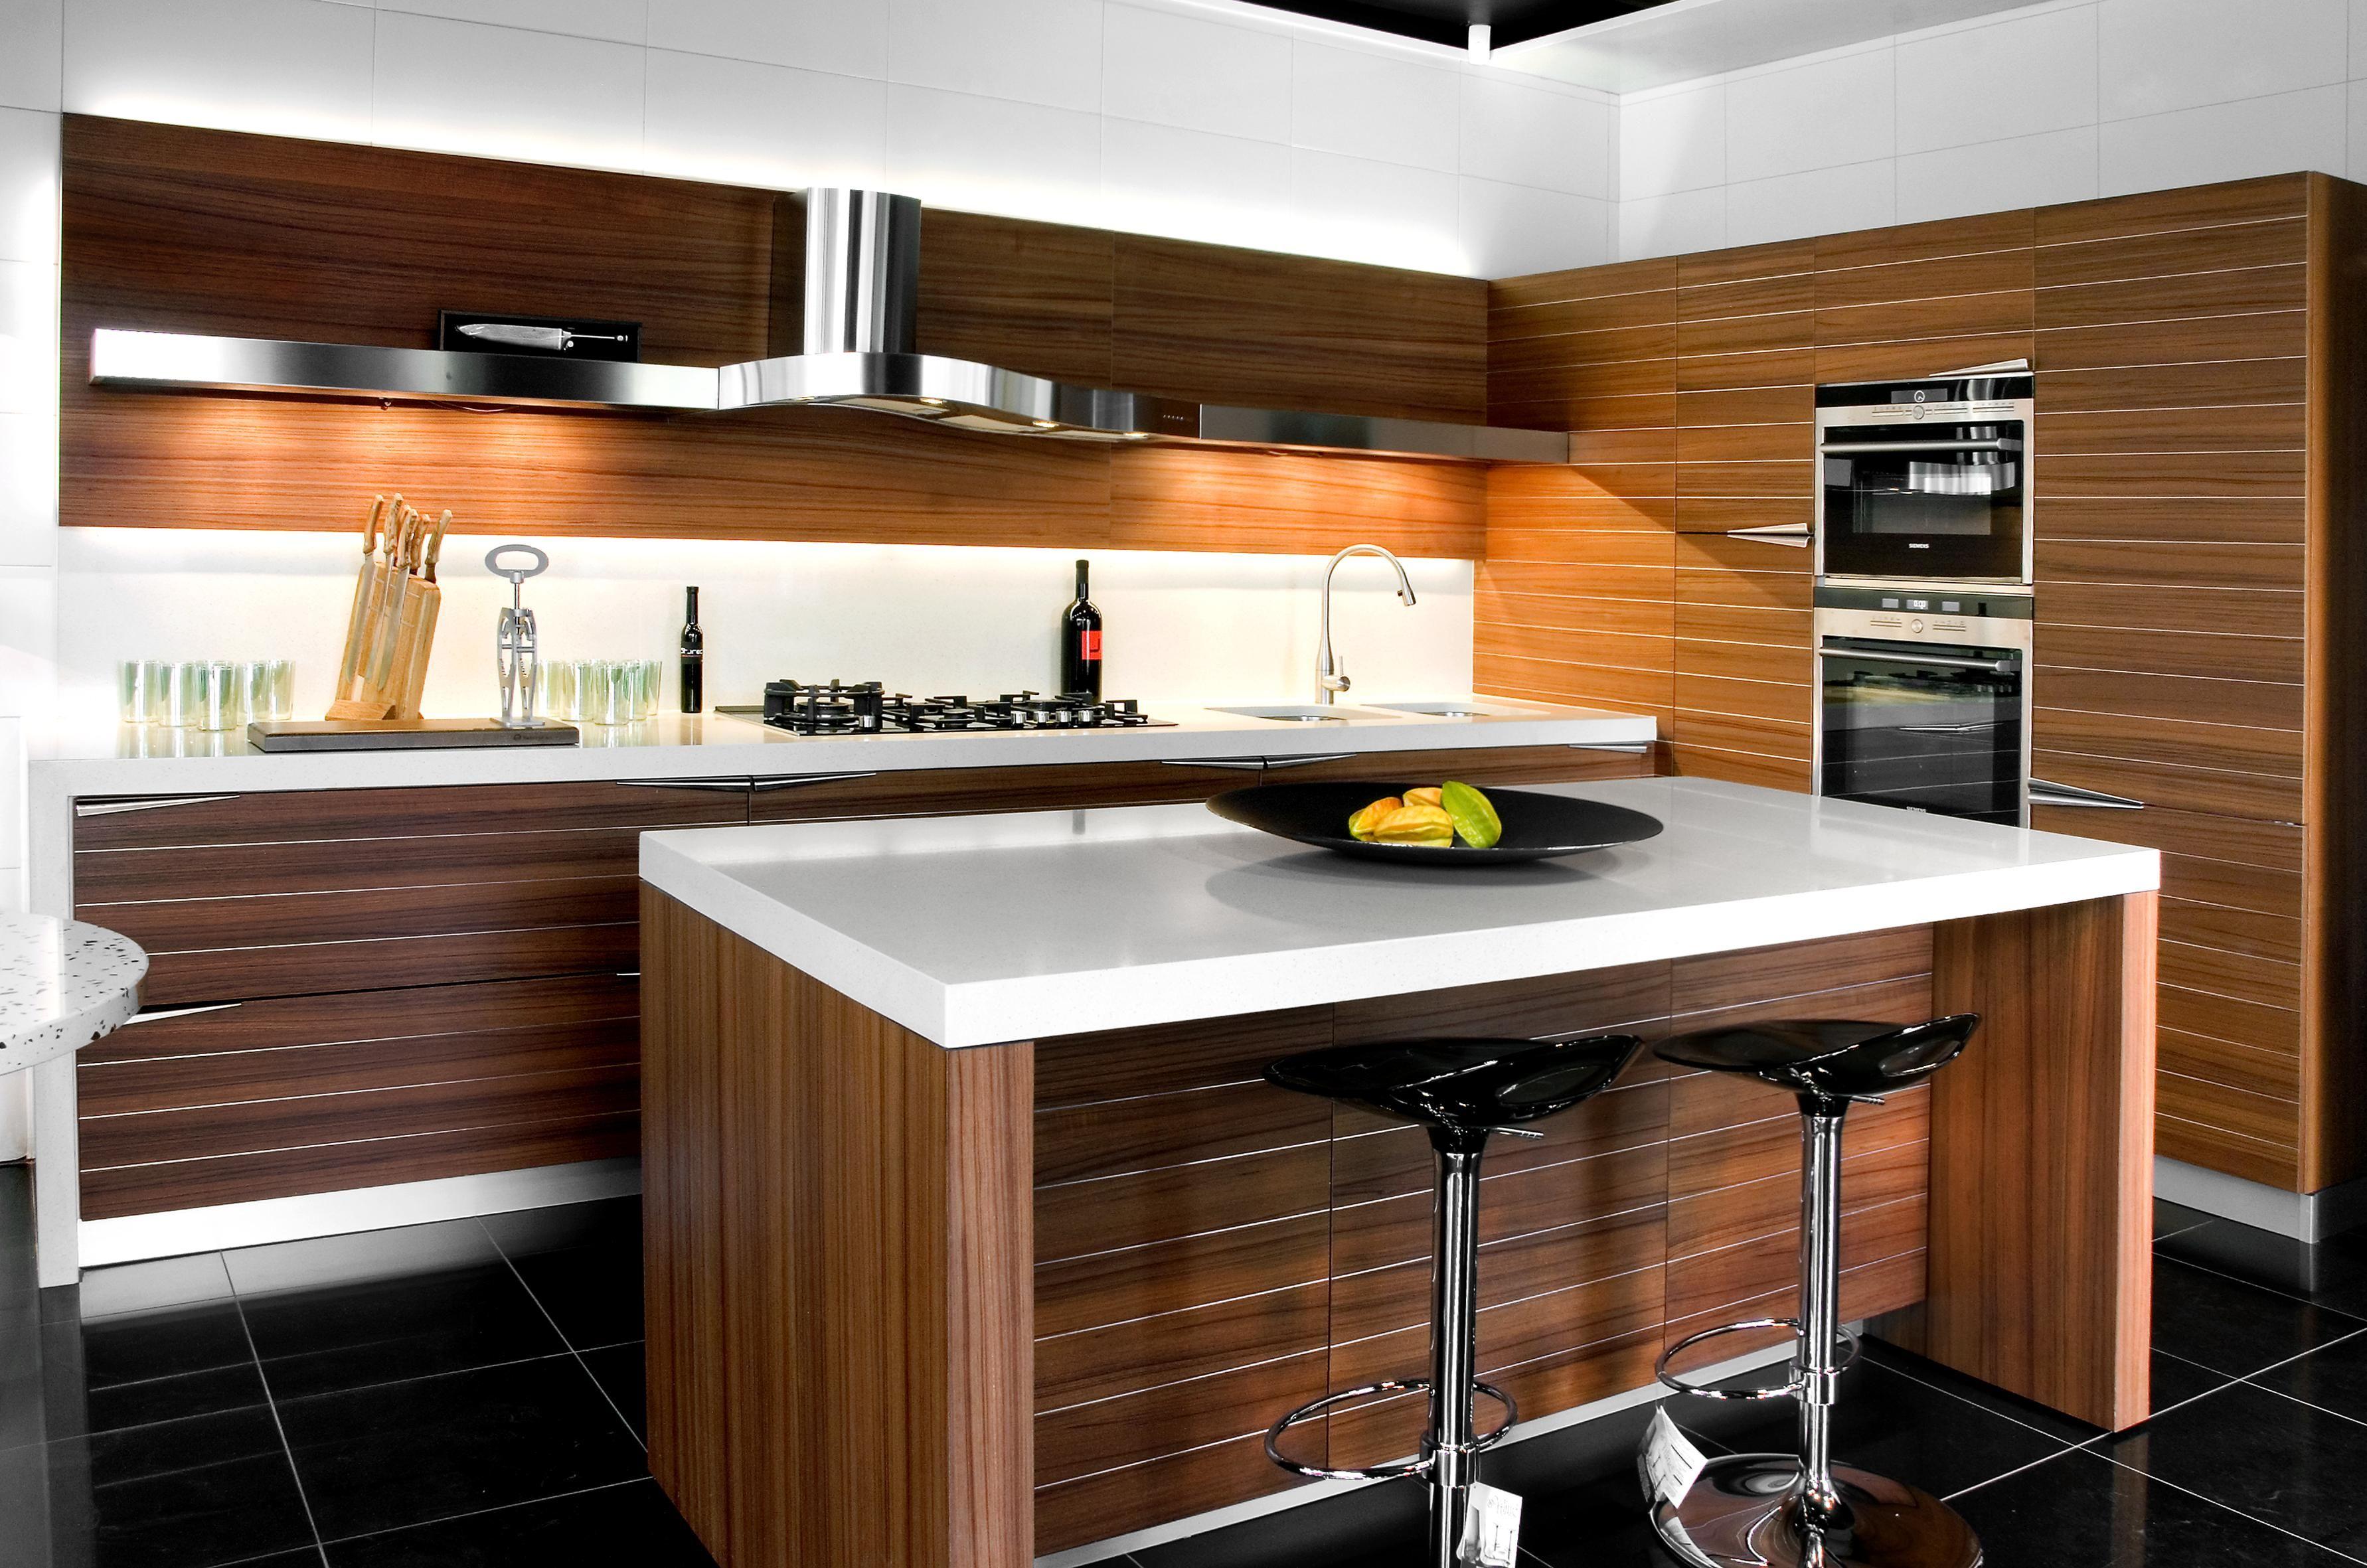 Kitchens TIME Teak wood with horizonal metal